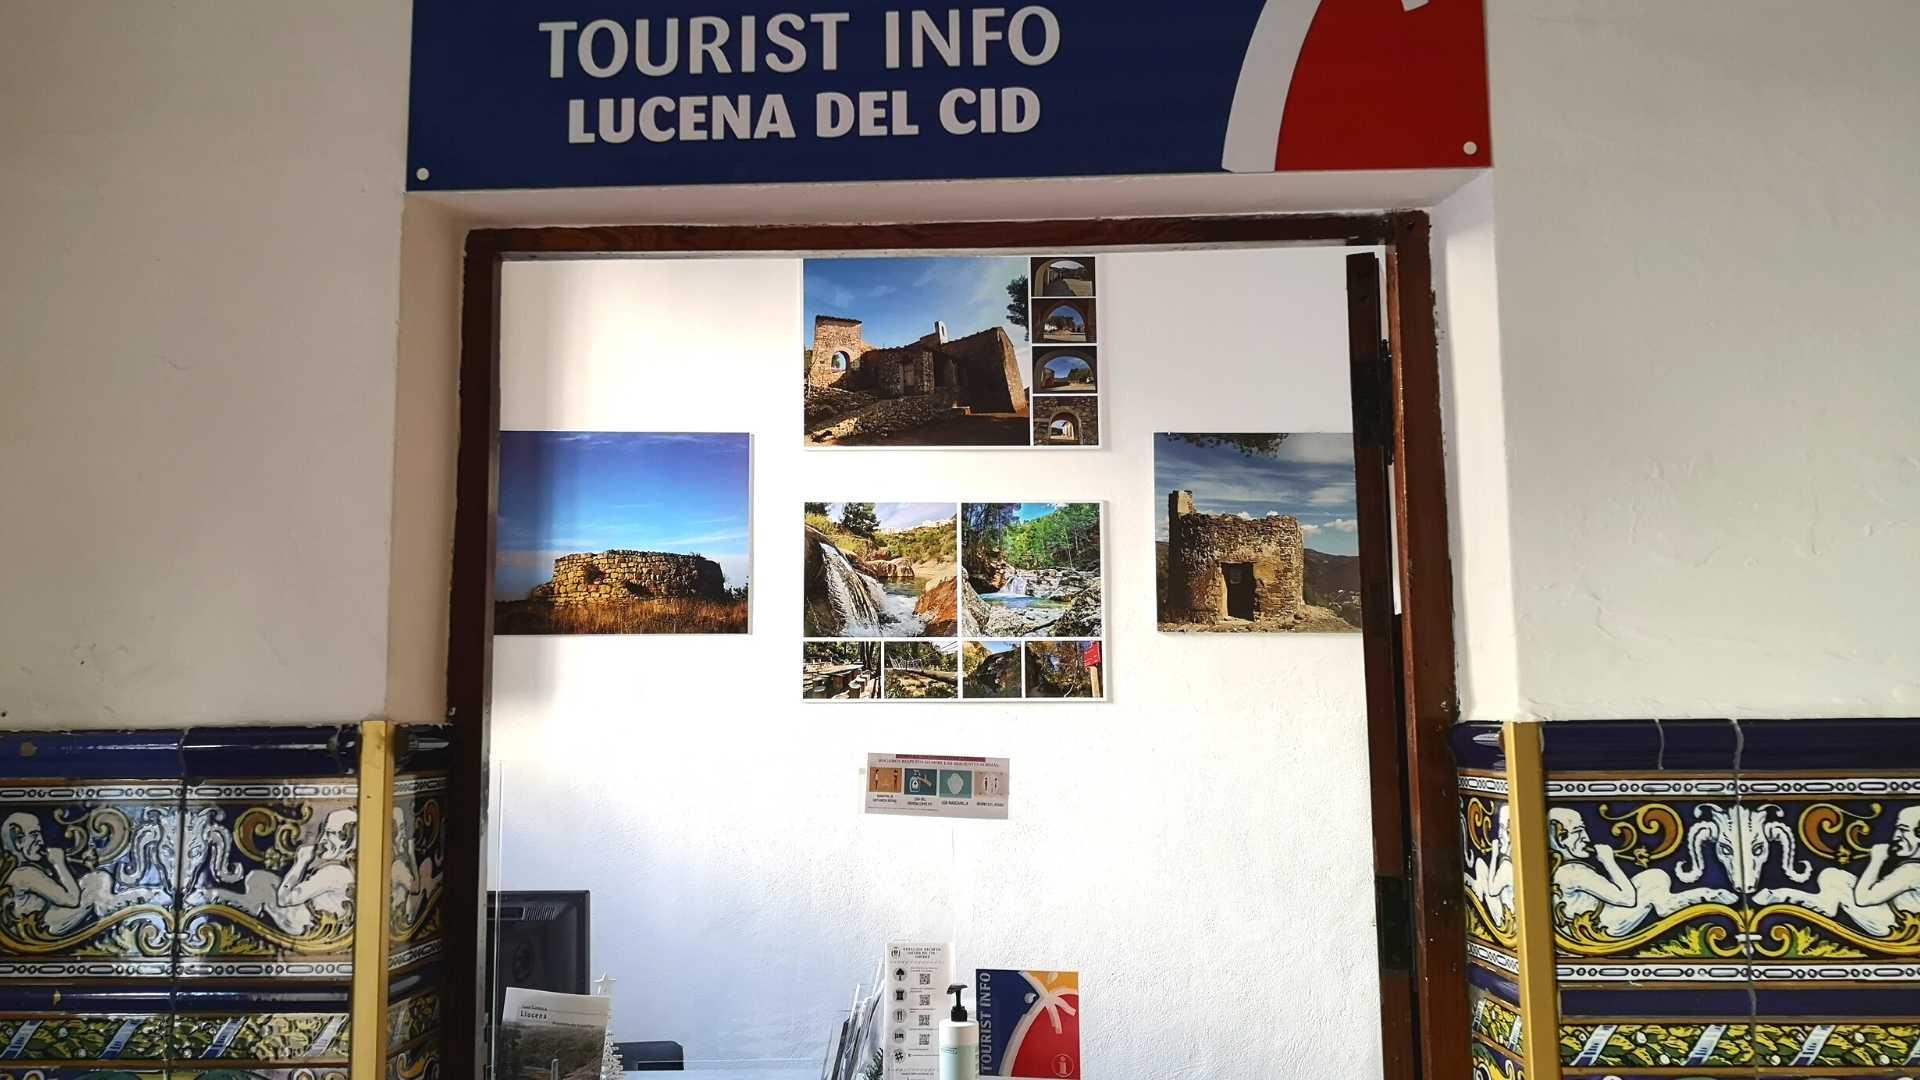 TOURIST INFO LUCENA DEL CID